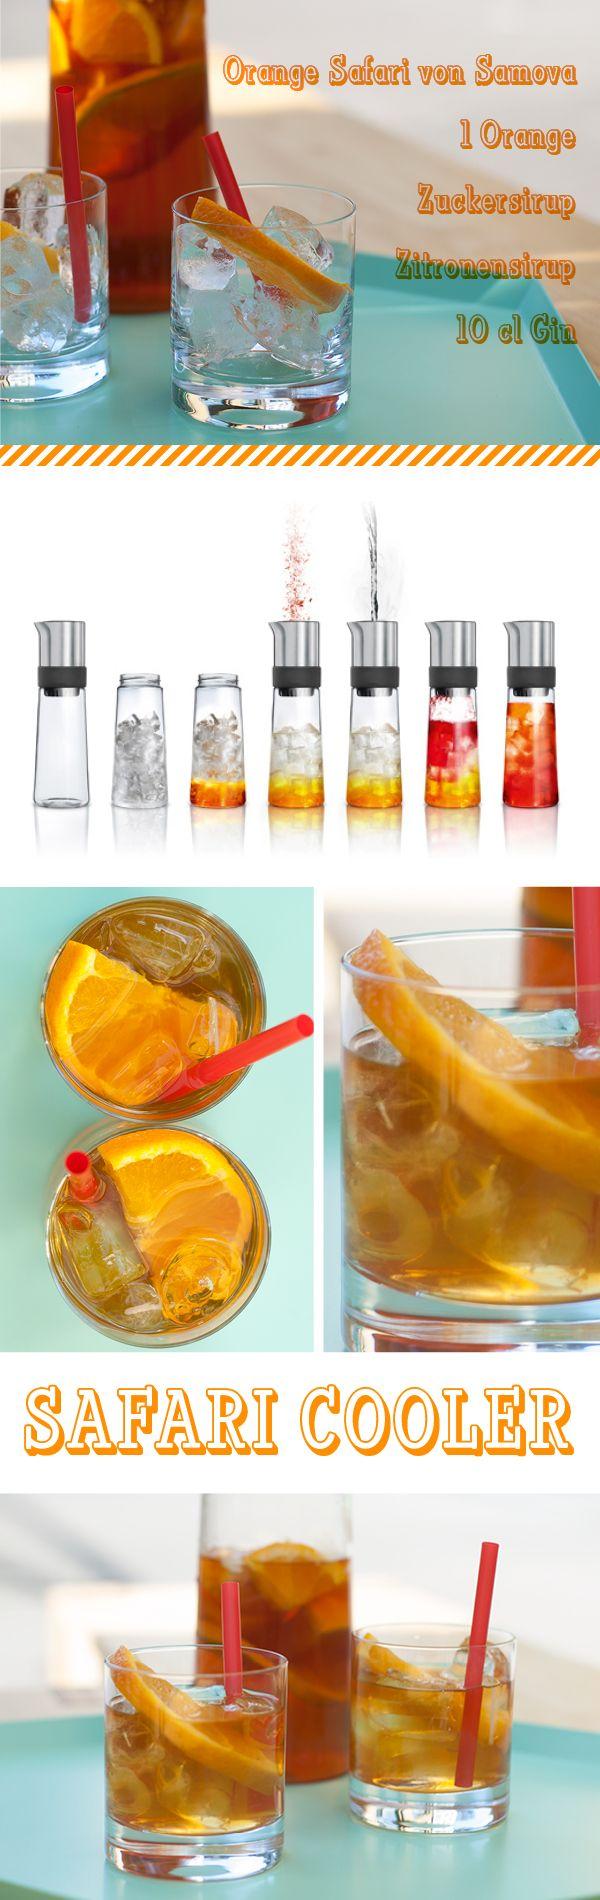 sodapop_safari_cooler